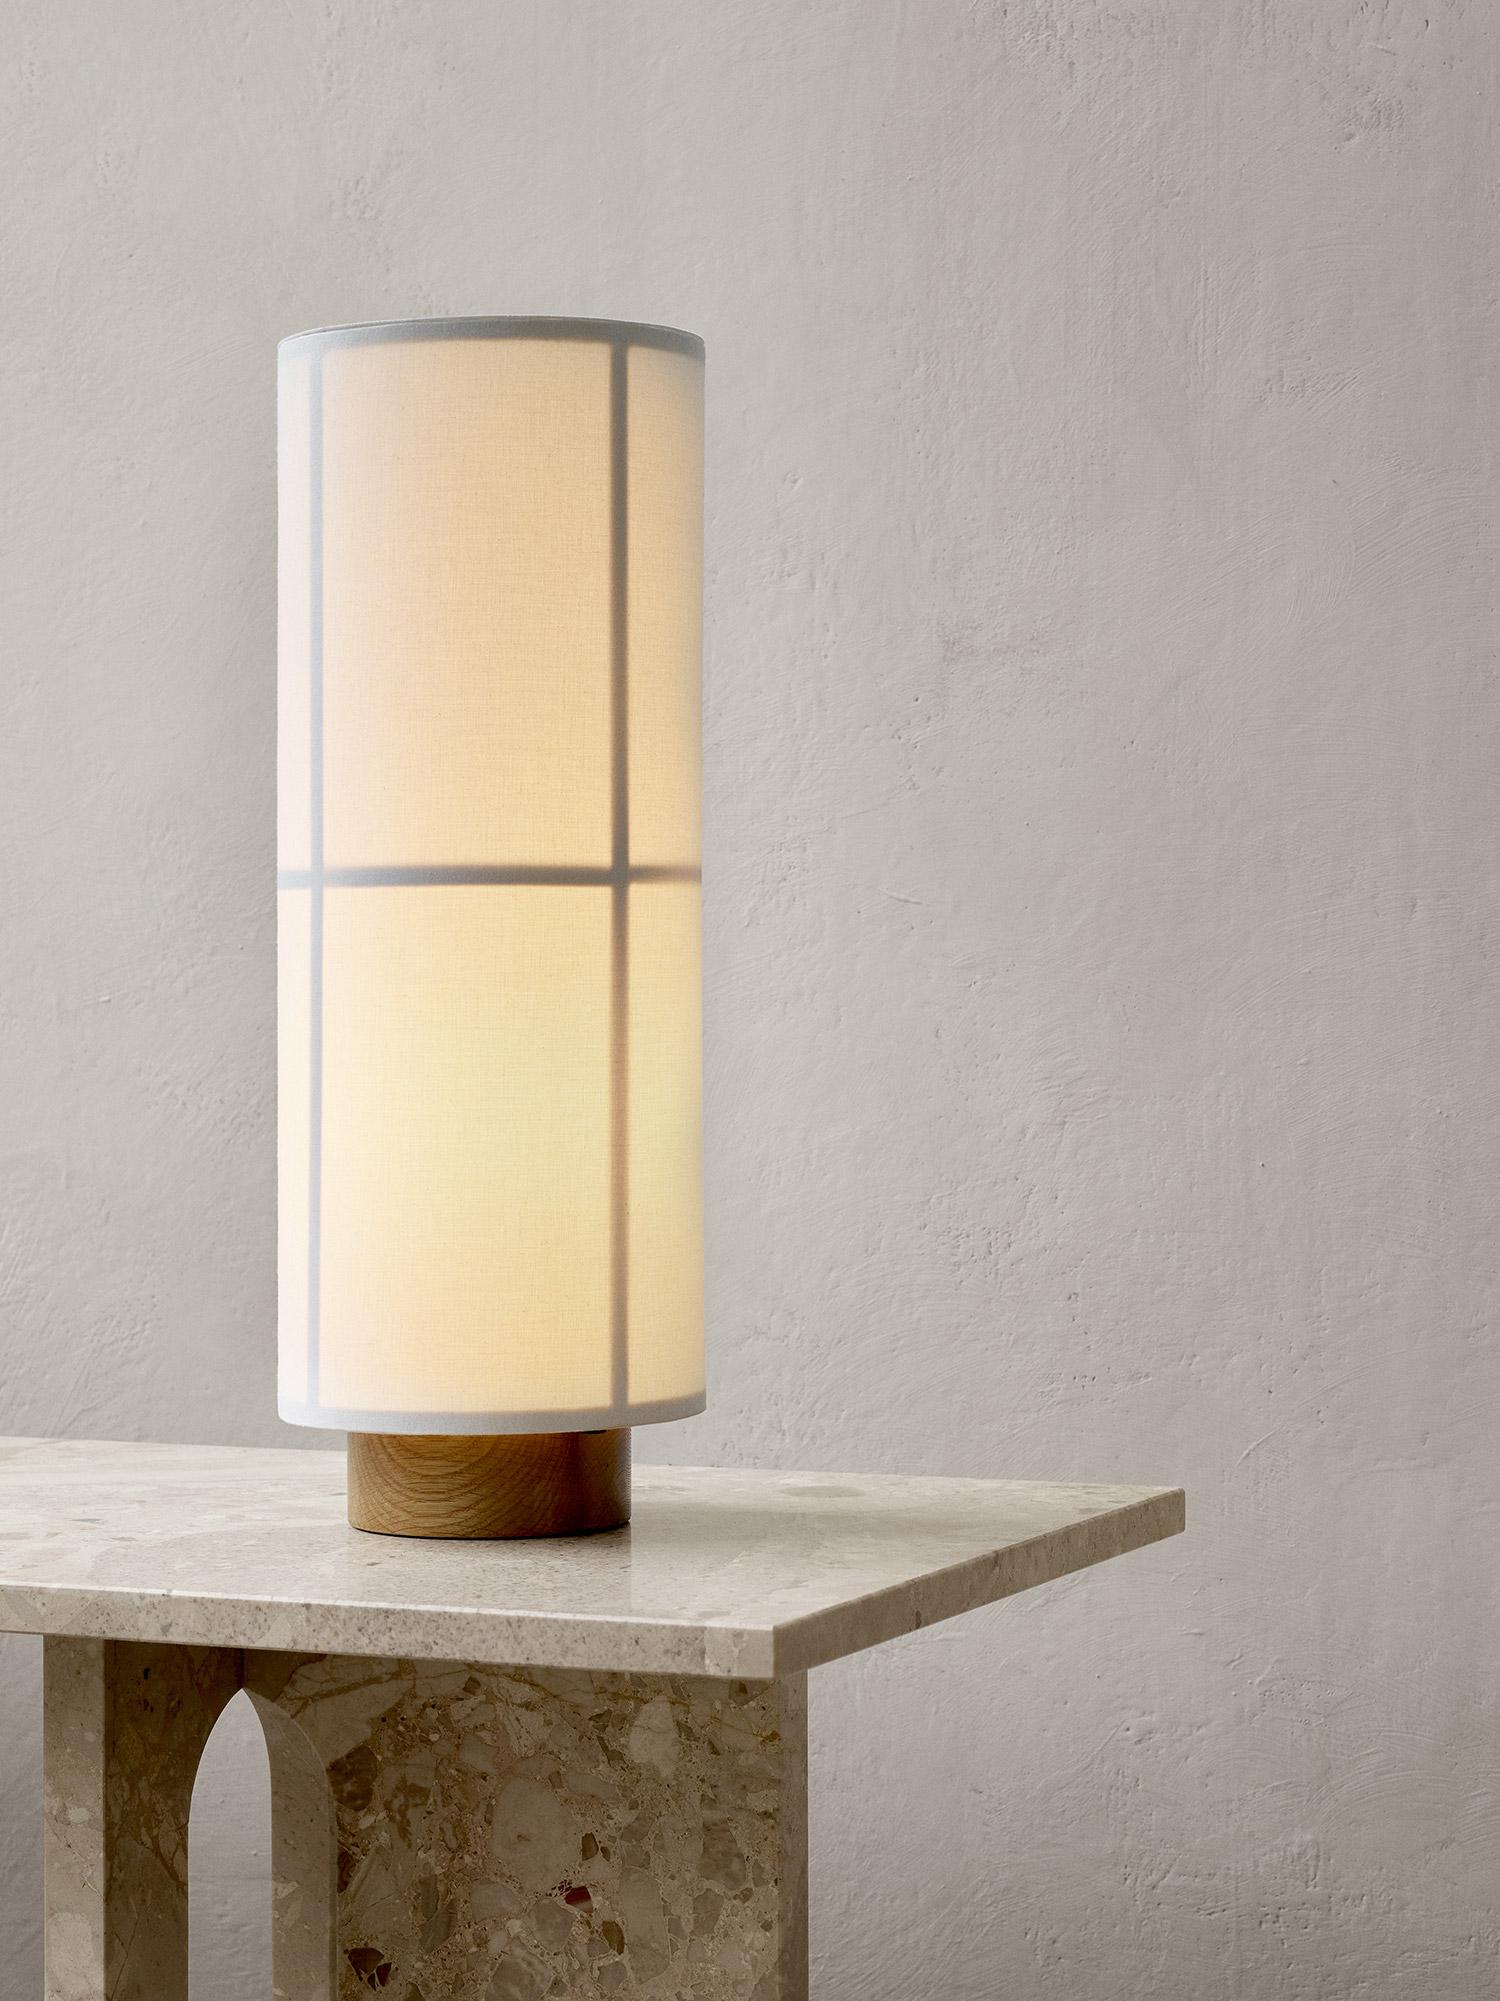 Hashira table lamp against grey wall